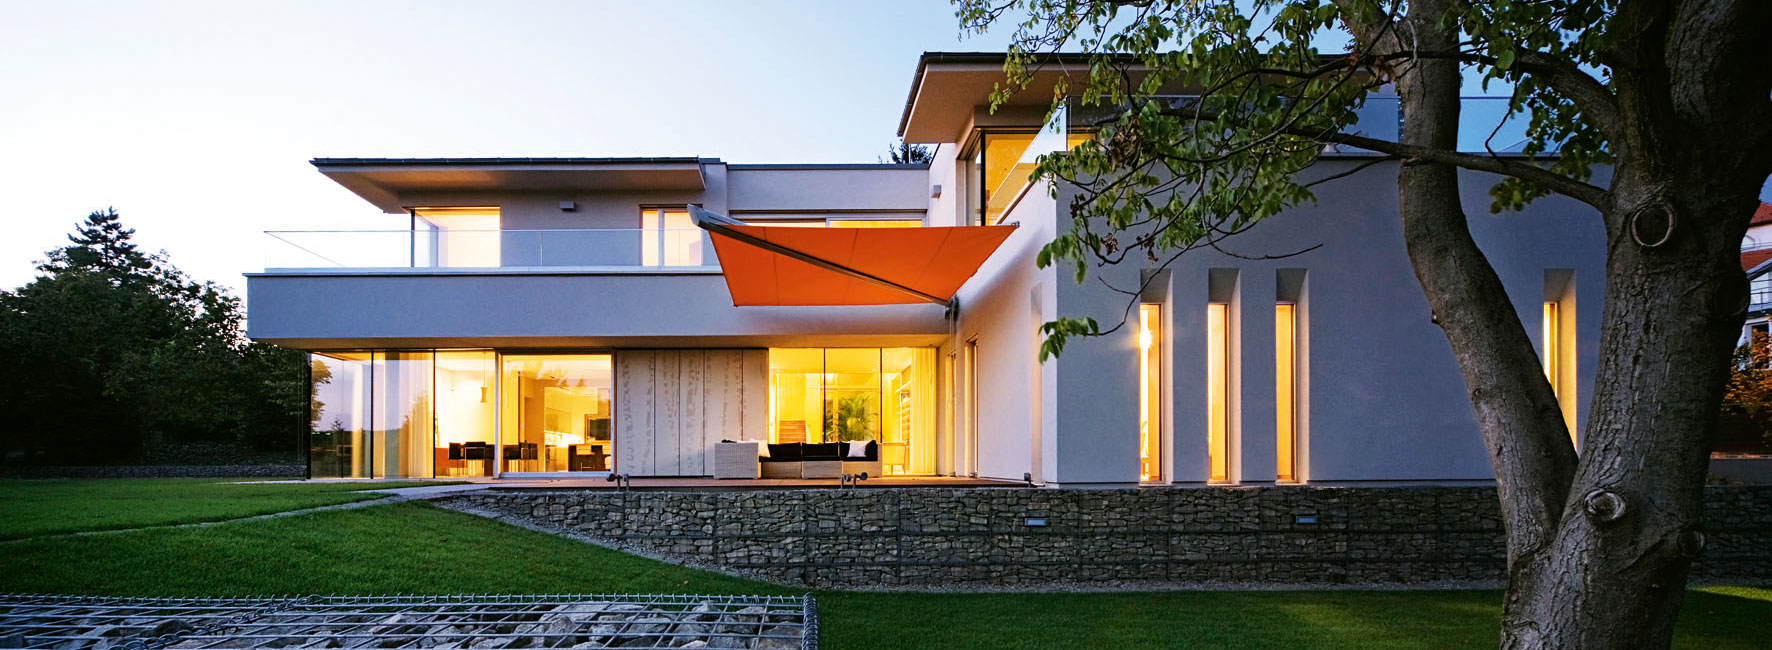 home ott gmbh glaserei fensterbau. Black Bedroom Furniture Sets. Home Design Ideas